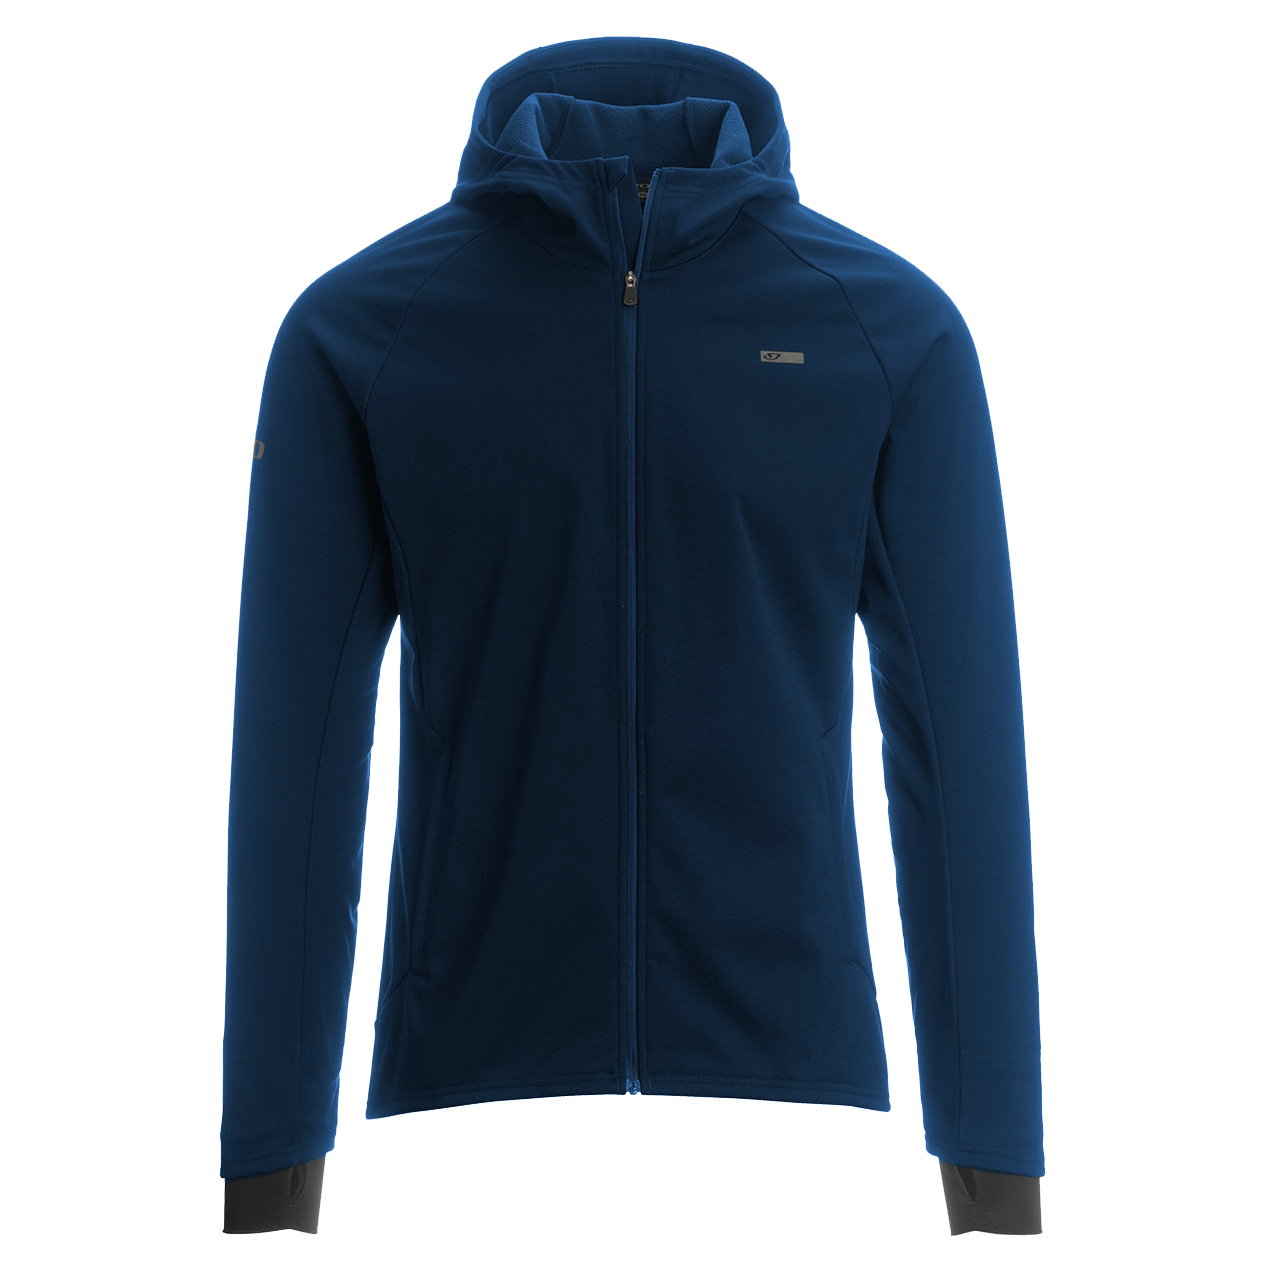 Giro Ambient Jacket Mens